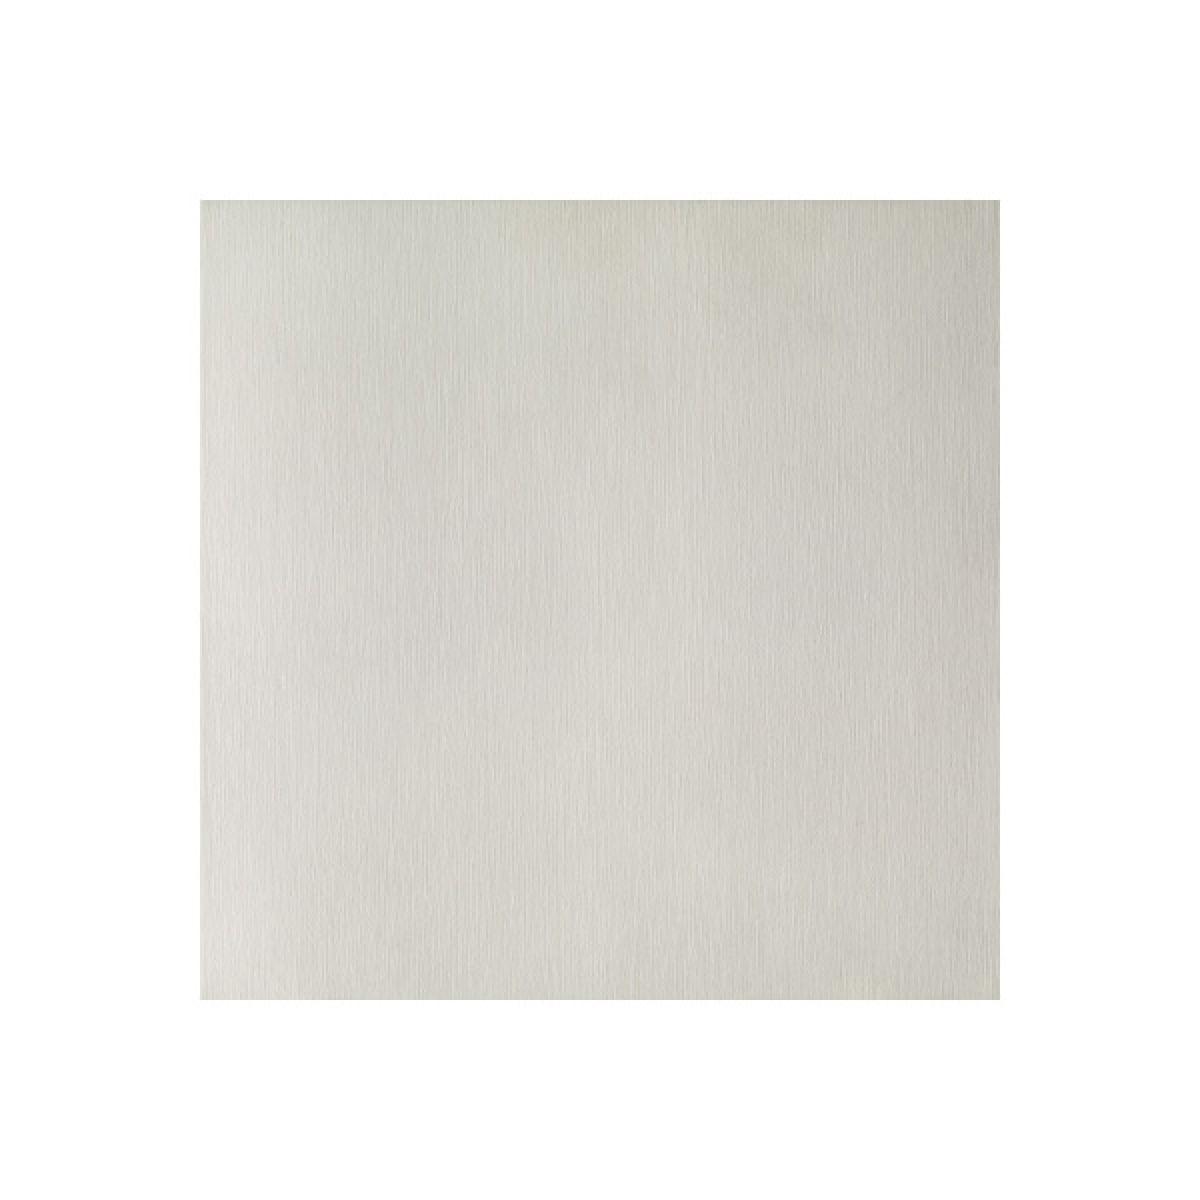 Imperial Bathrooms Edwardian Floor Tile White 33 X 33cm